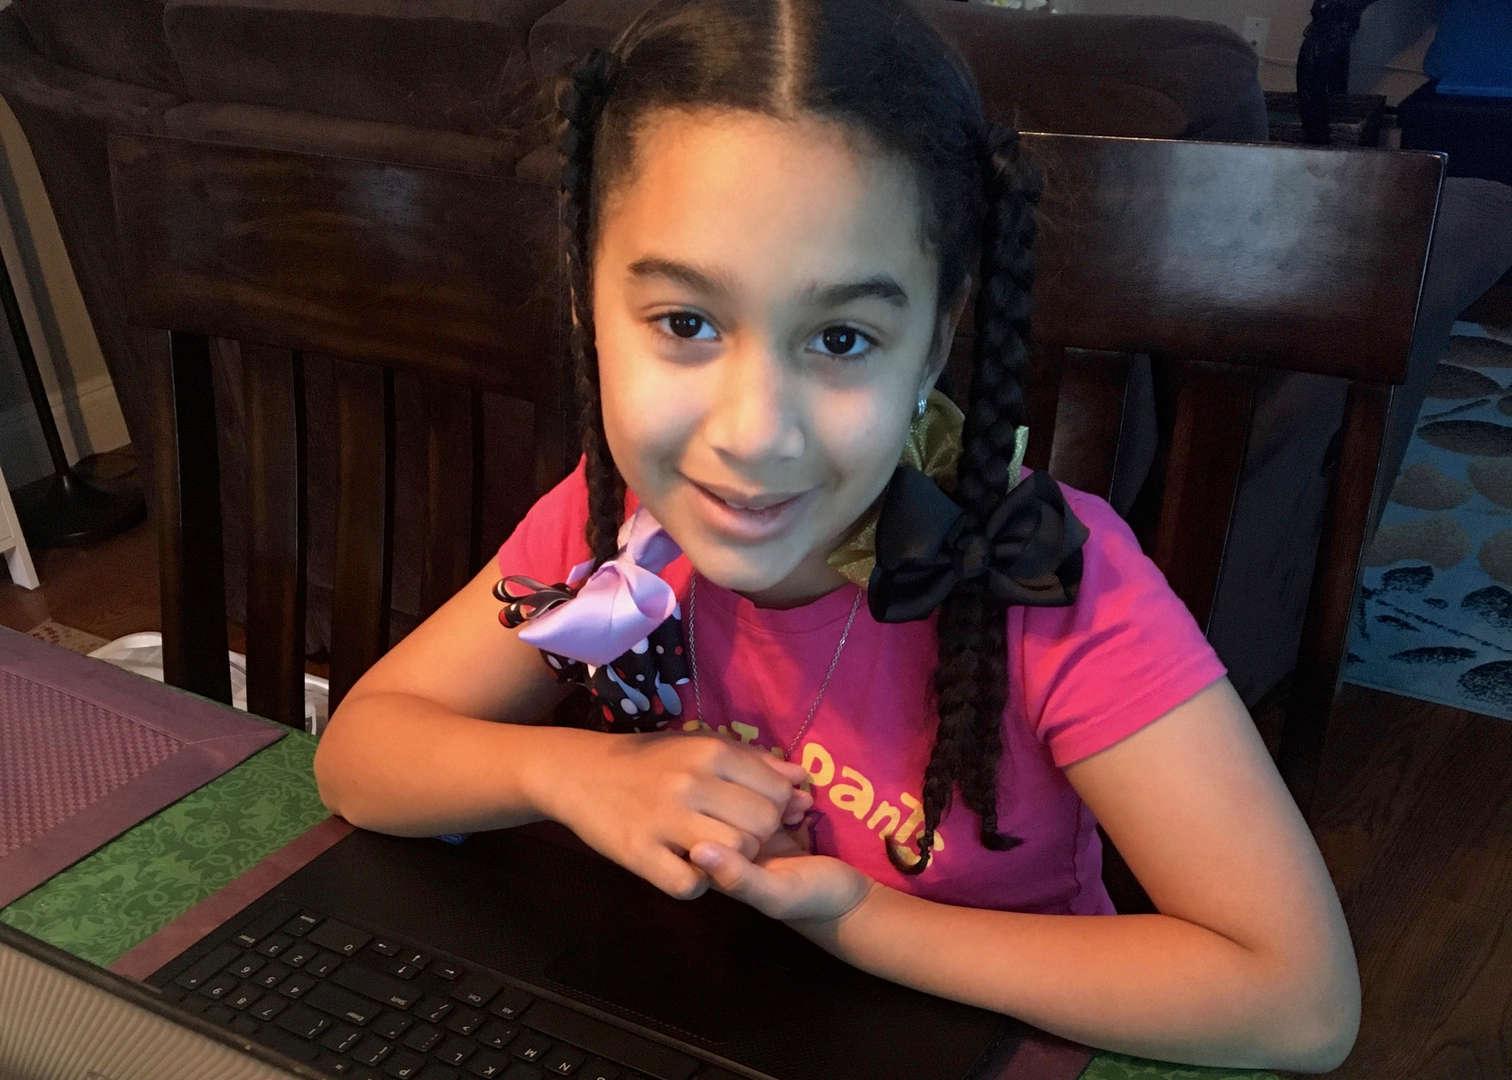 Female Student smiling at desk